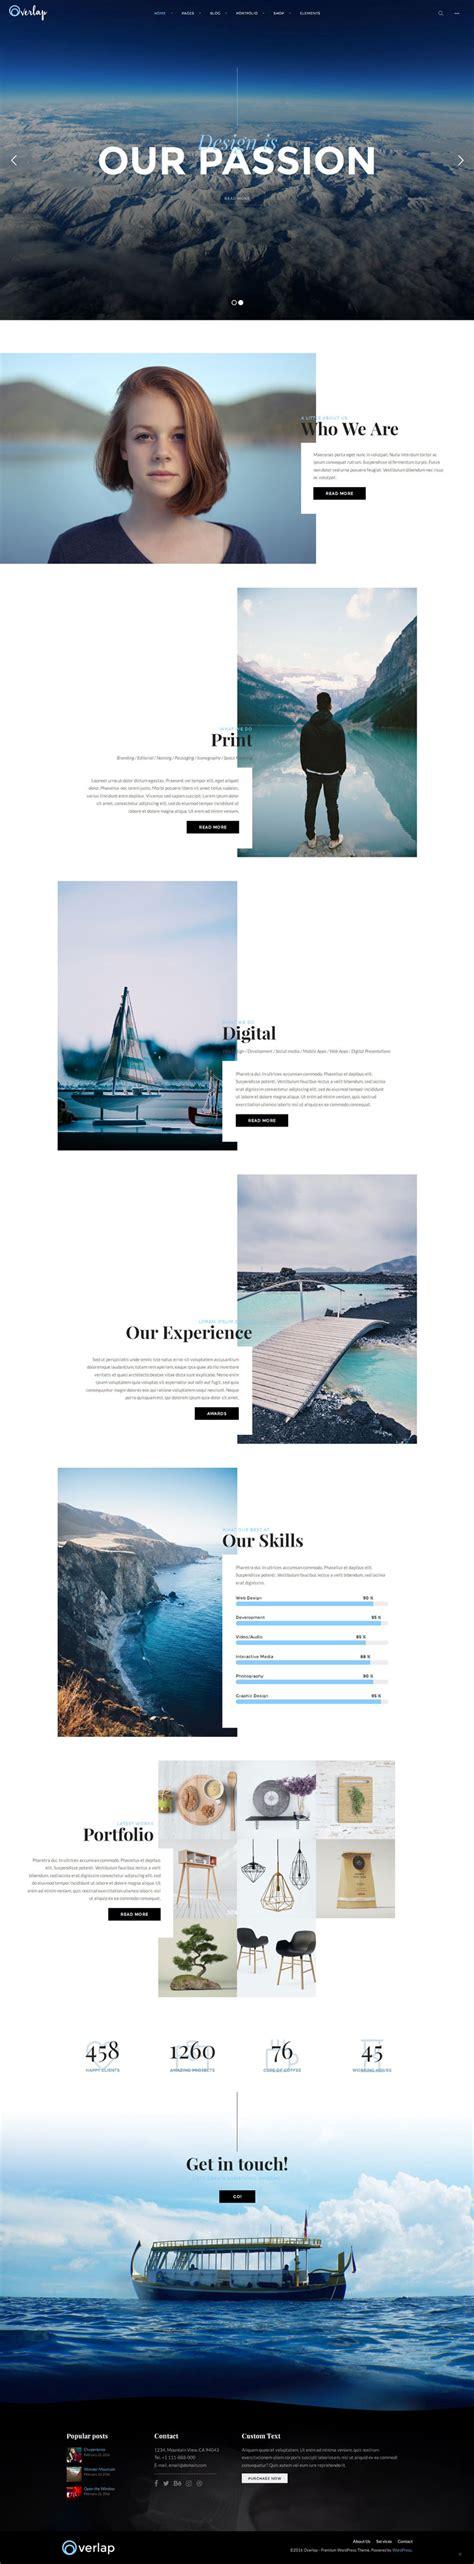 wordpress themes design inspiration creative but newest website designs for inspiration